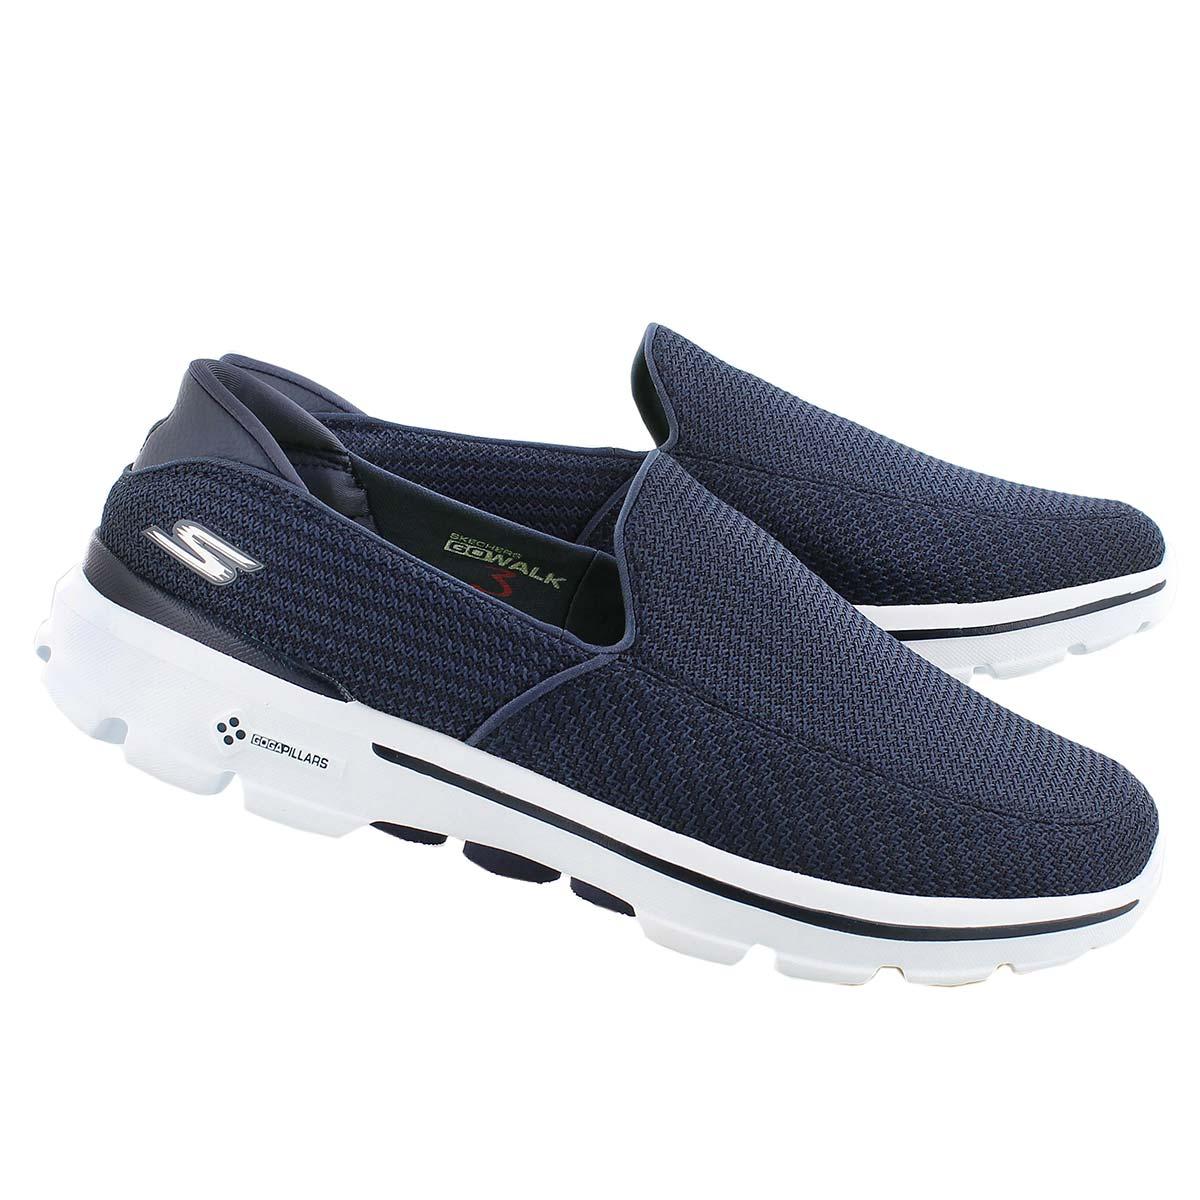 Mns GOwalk 3 nvy/wht slip on shoe